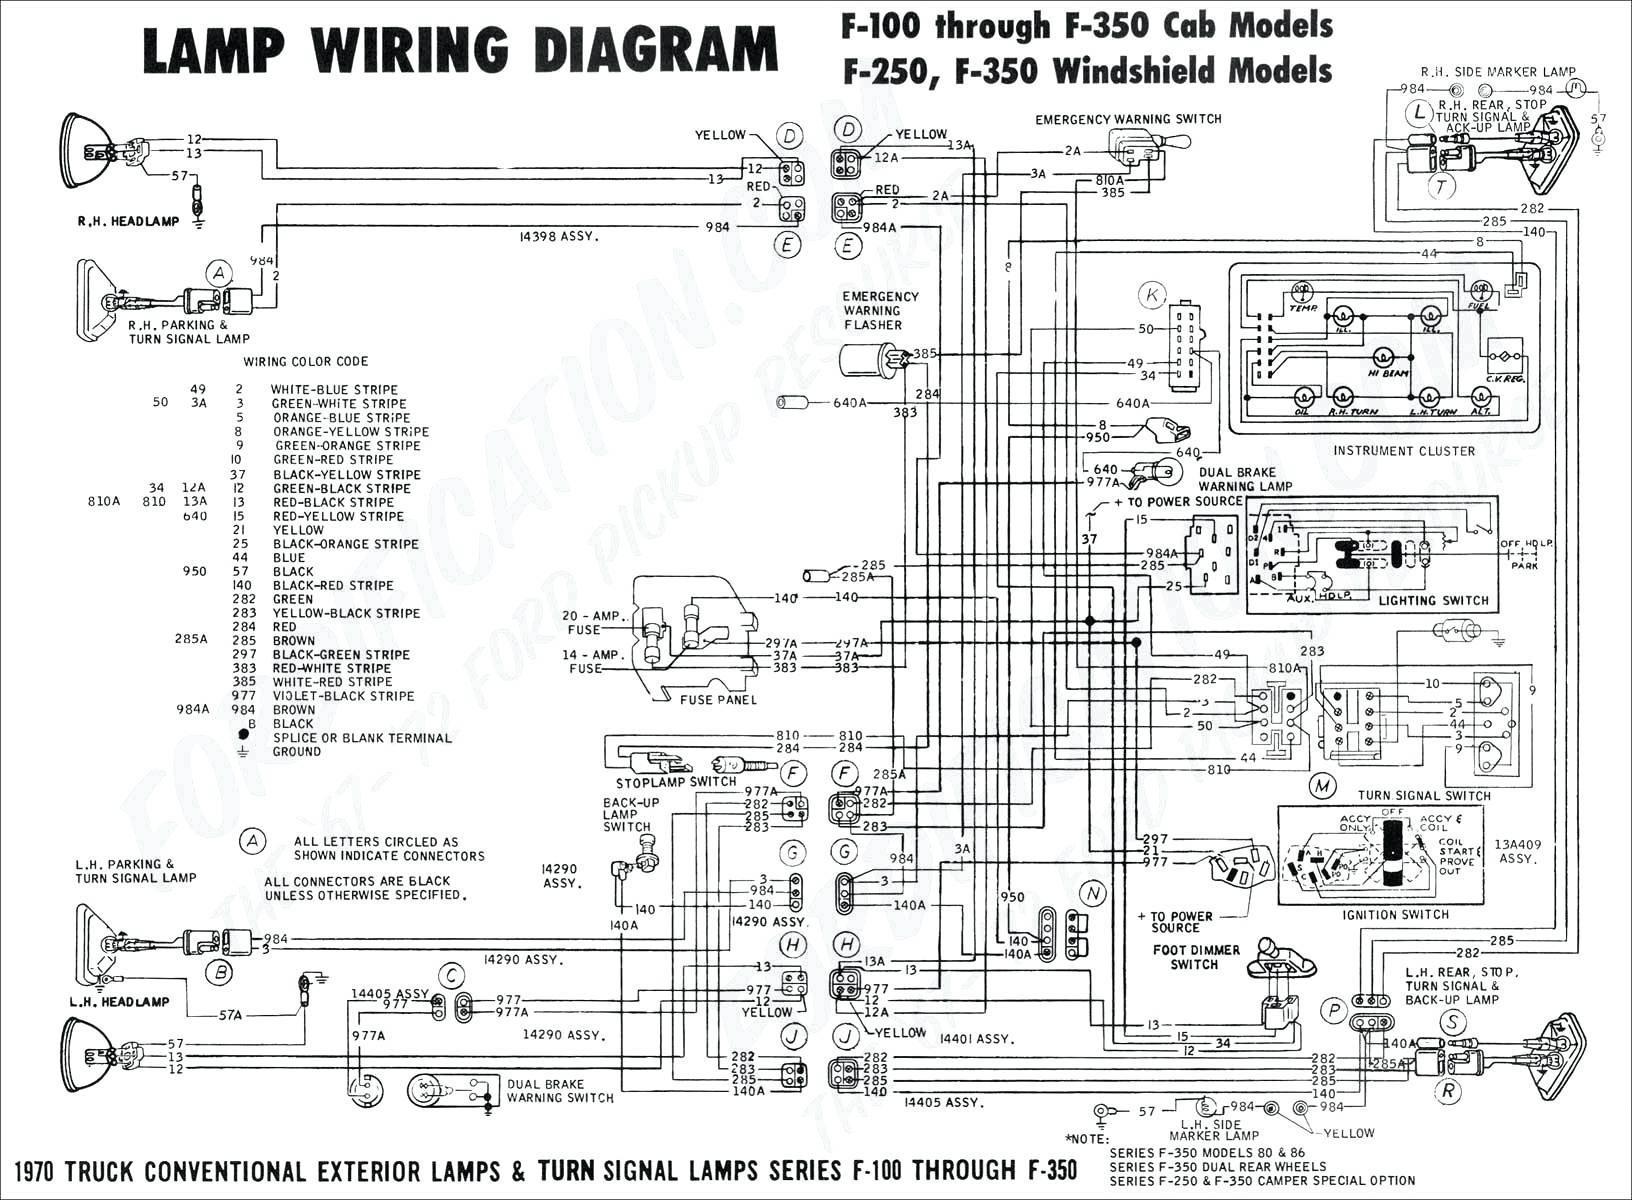 electric trailer jack wiring diagram Collection-Wiring Diagram for Electric Trailer Jack Refrence Wiring Diagram Rv Trailer New Coachman Motorhome Wiring Diagram 9-d